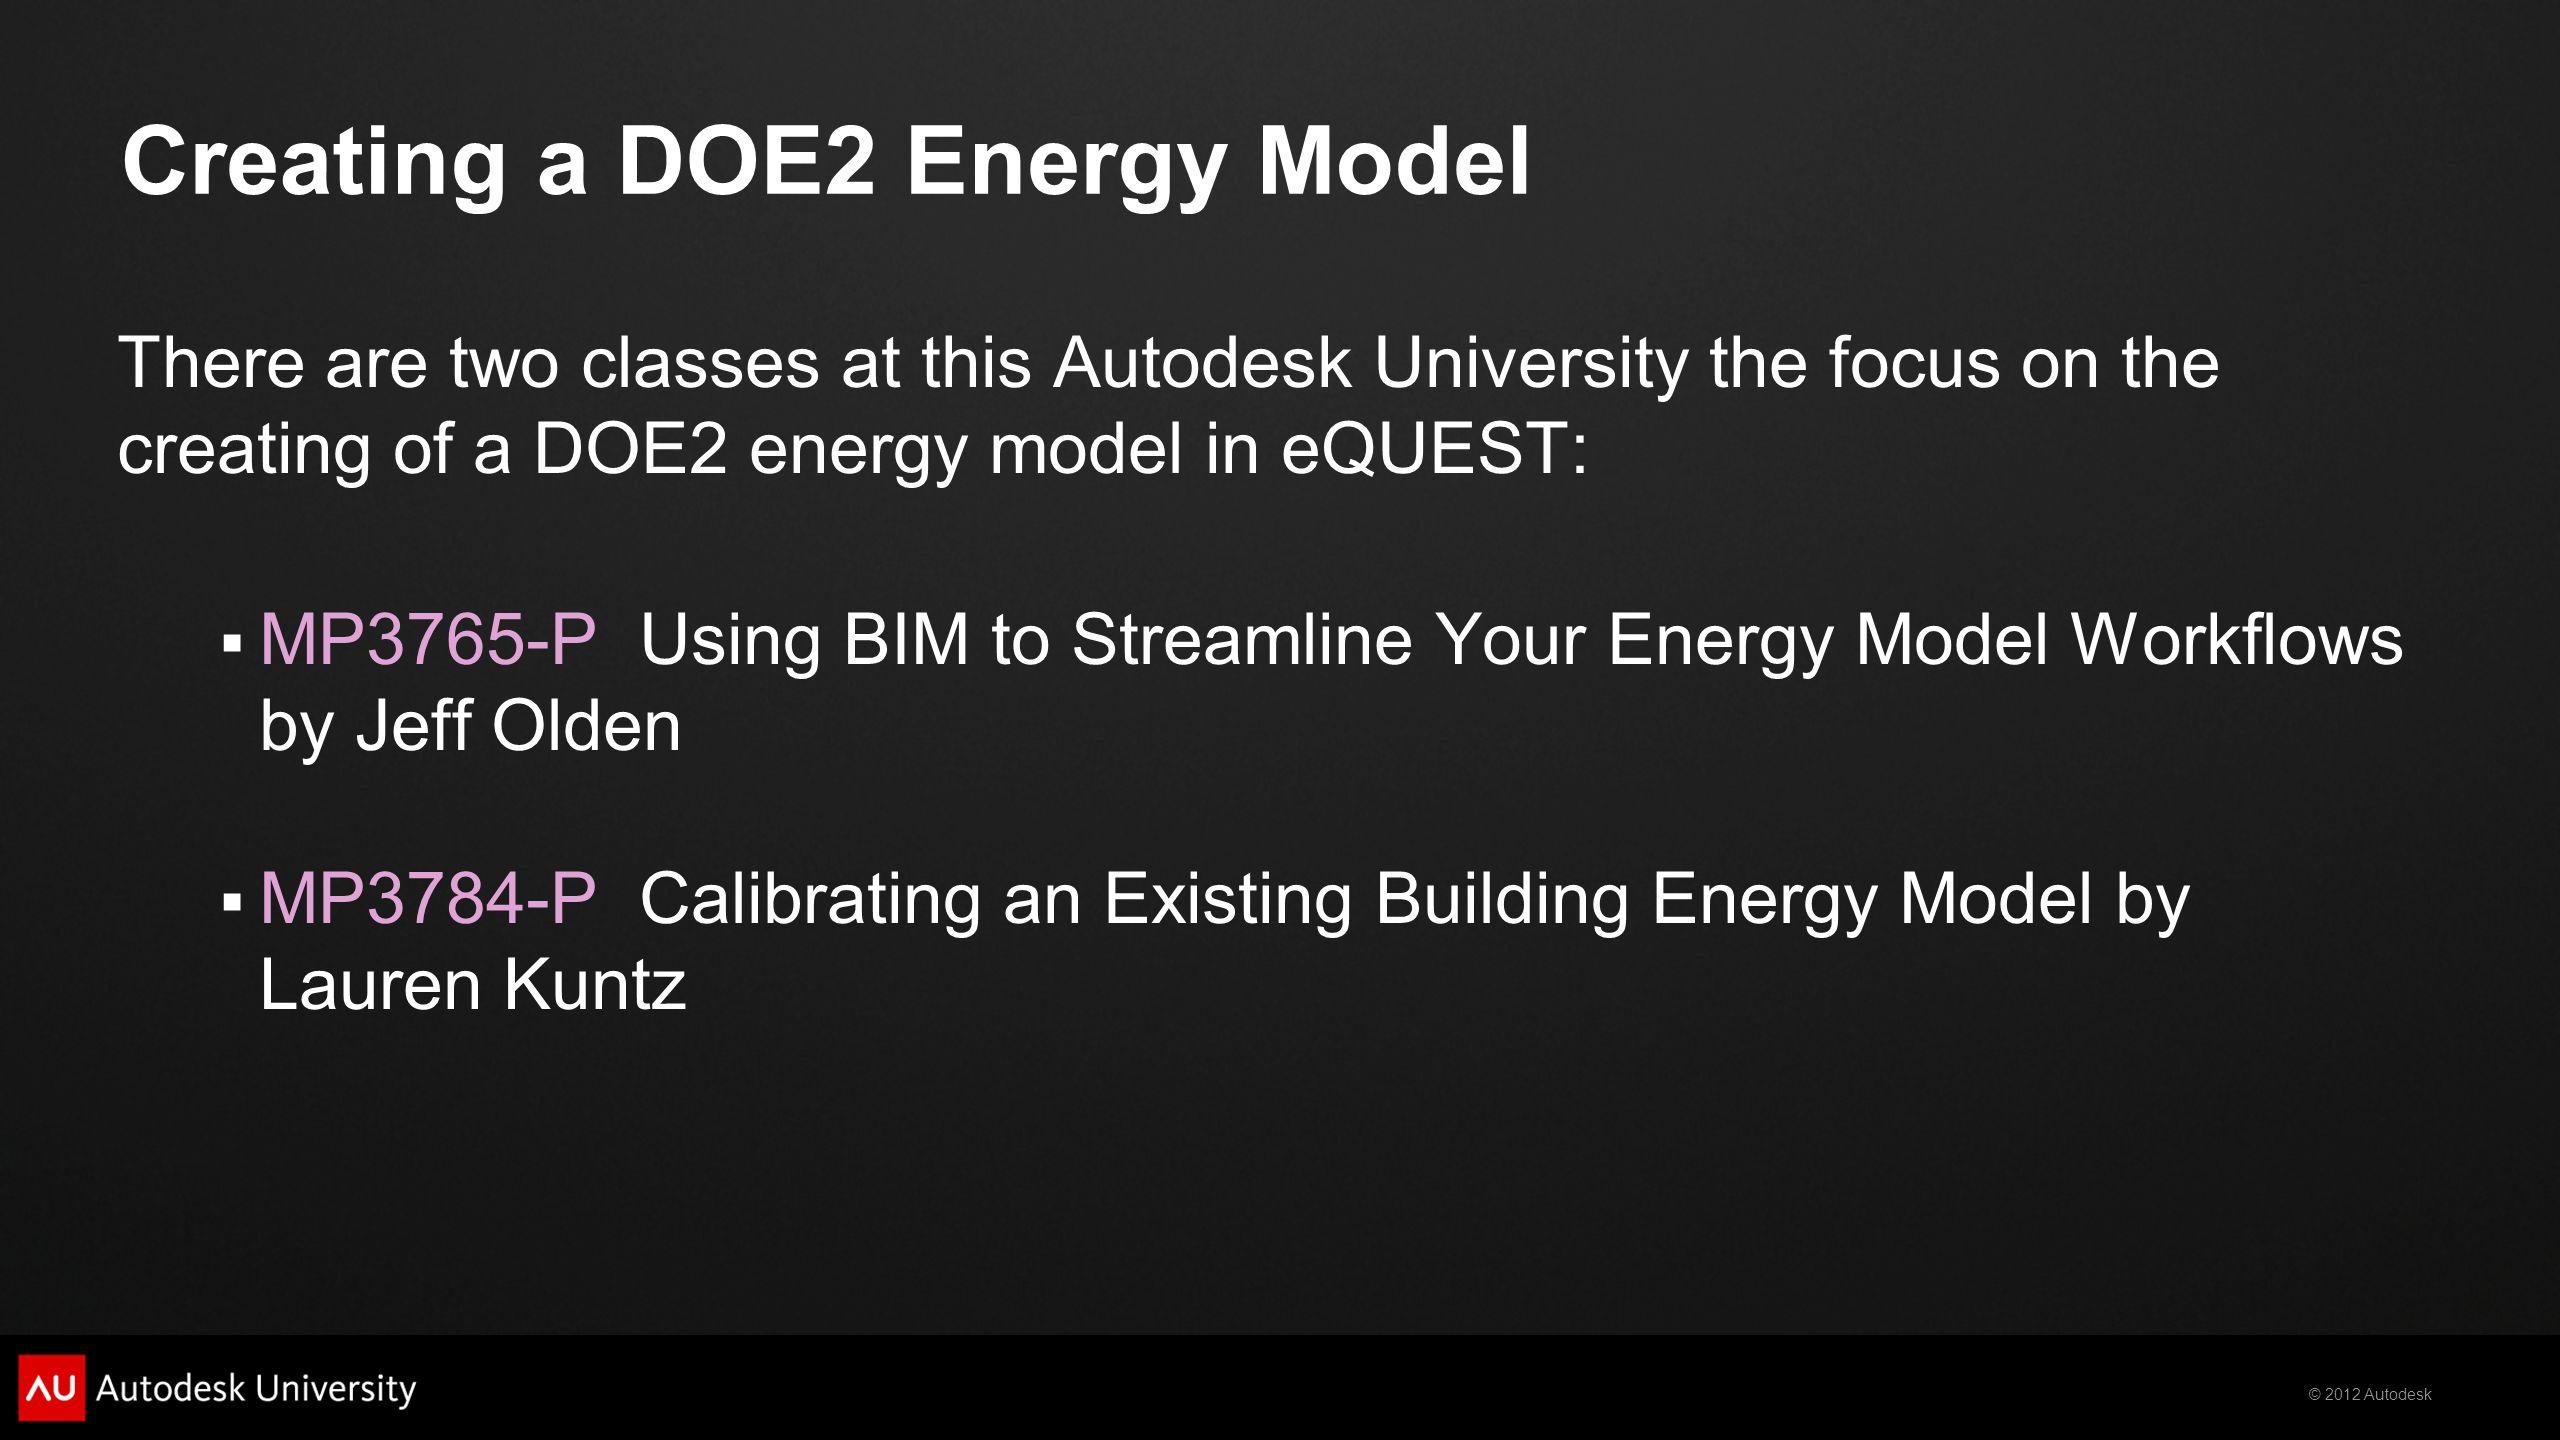 Creating a DOE2 Energy Model